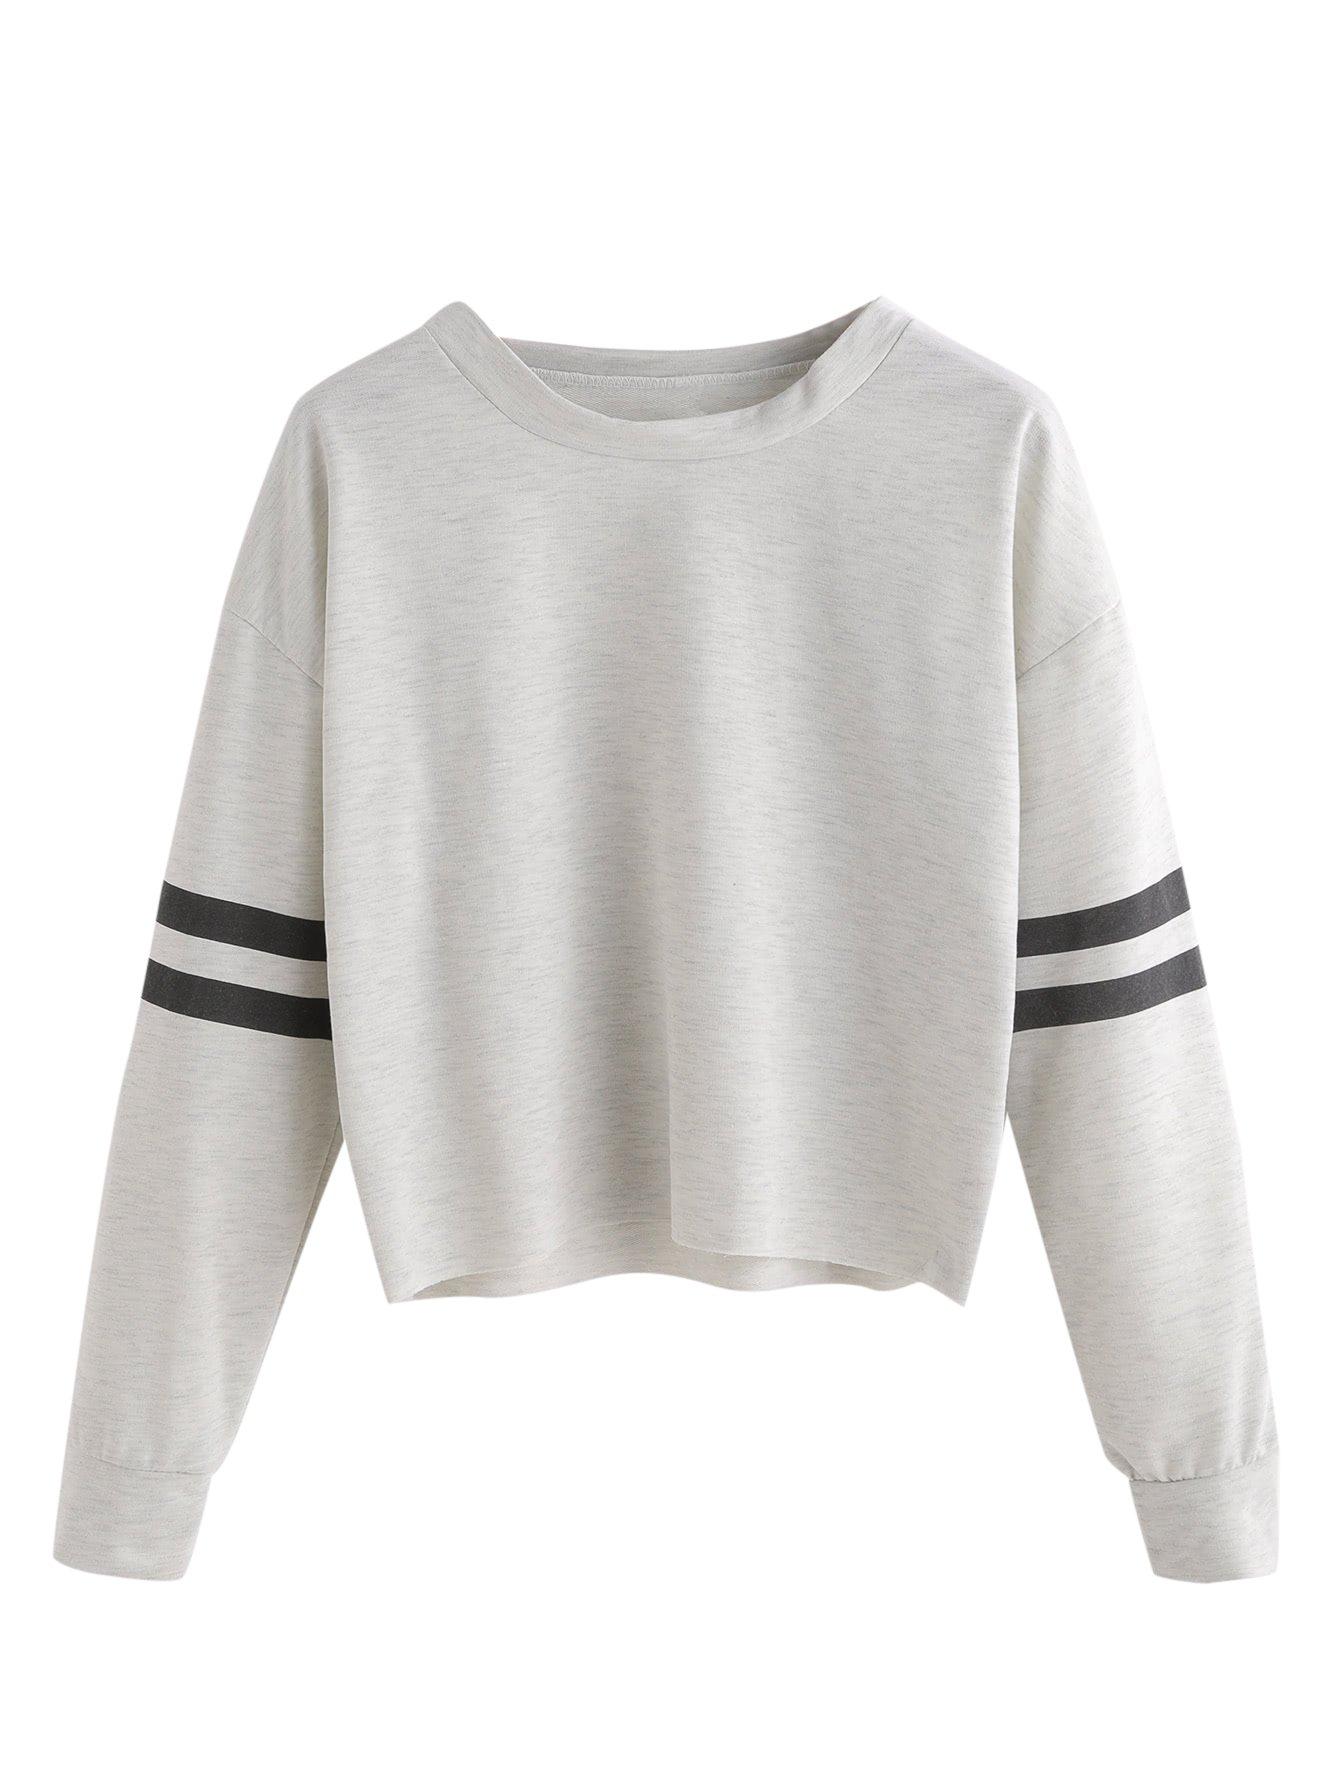 SweatyRocks Women's Striped Long Sleeve Crewneck Crop Top Sweatshirt Grey M